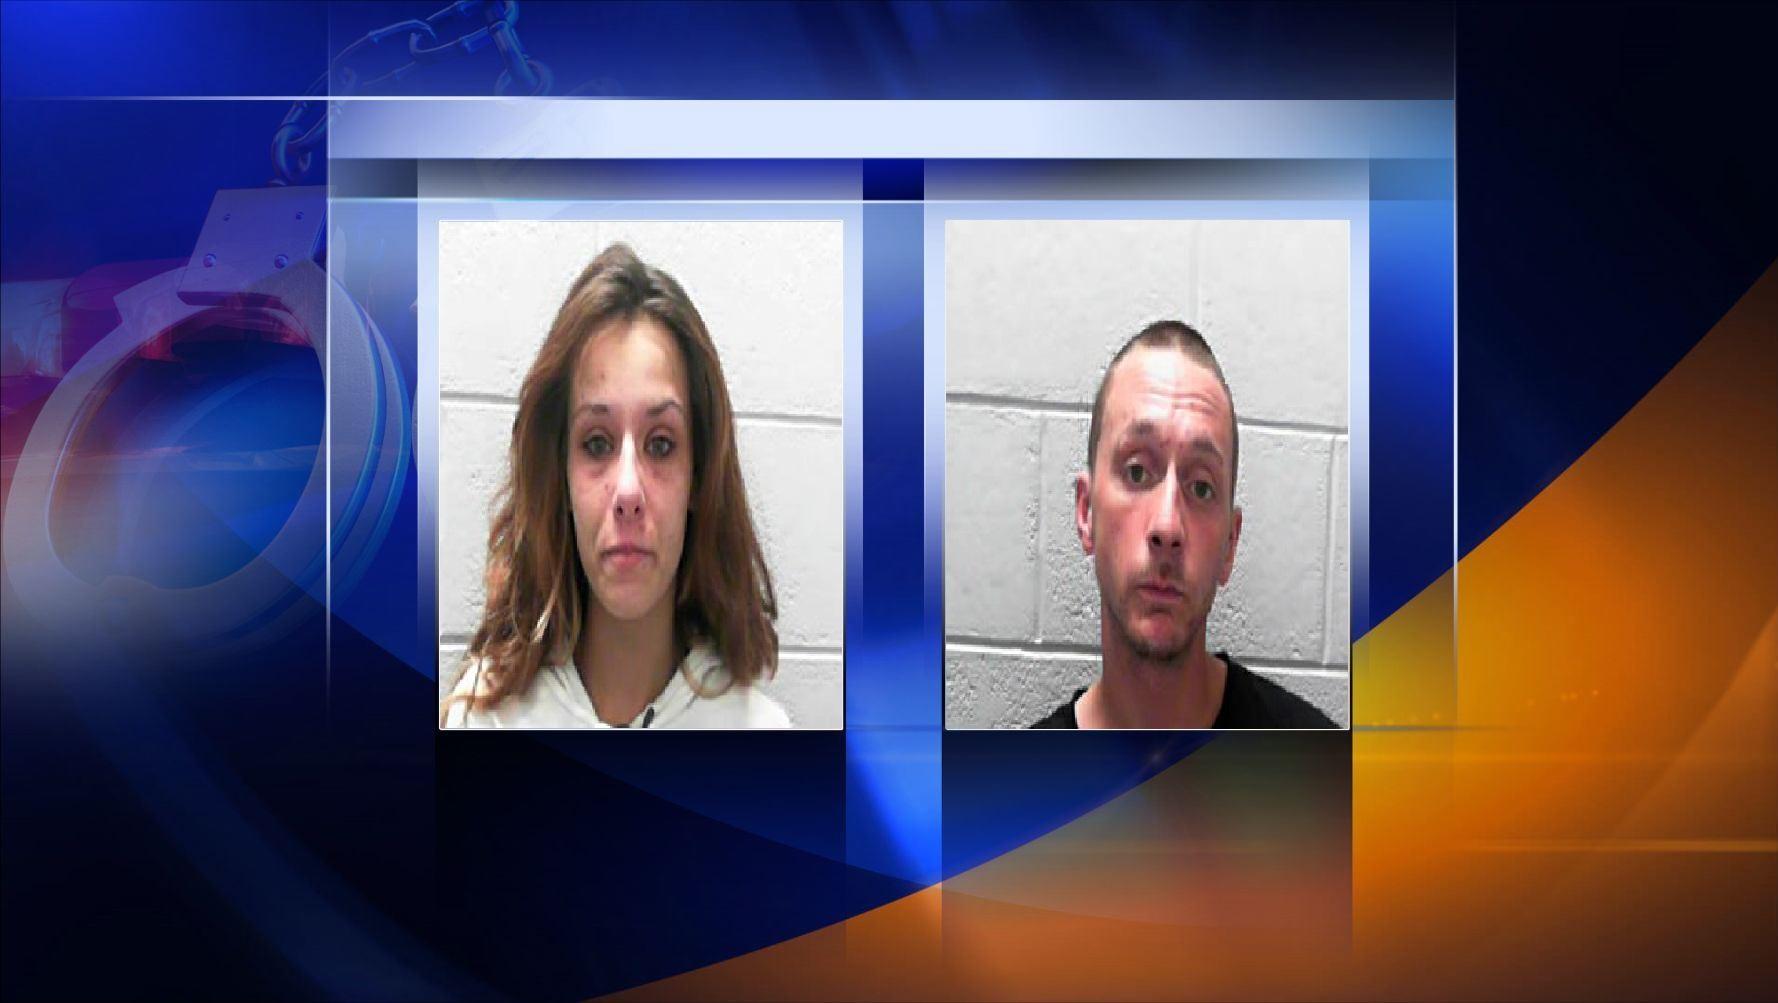 Deputy arrests 2 people in Preston County after finding